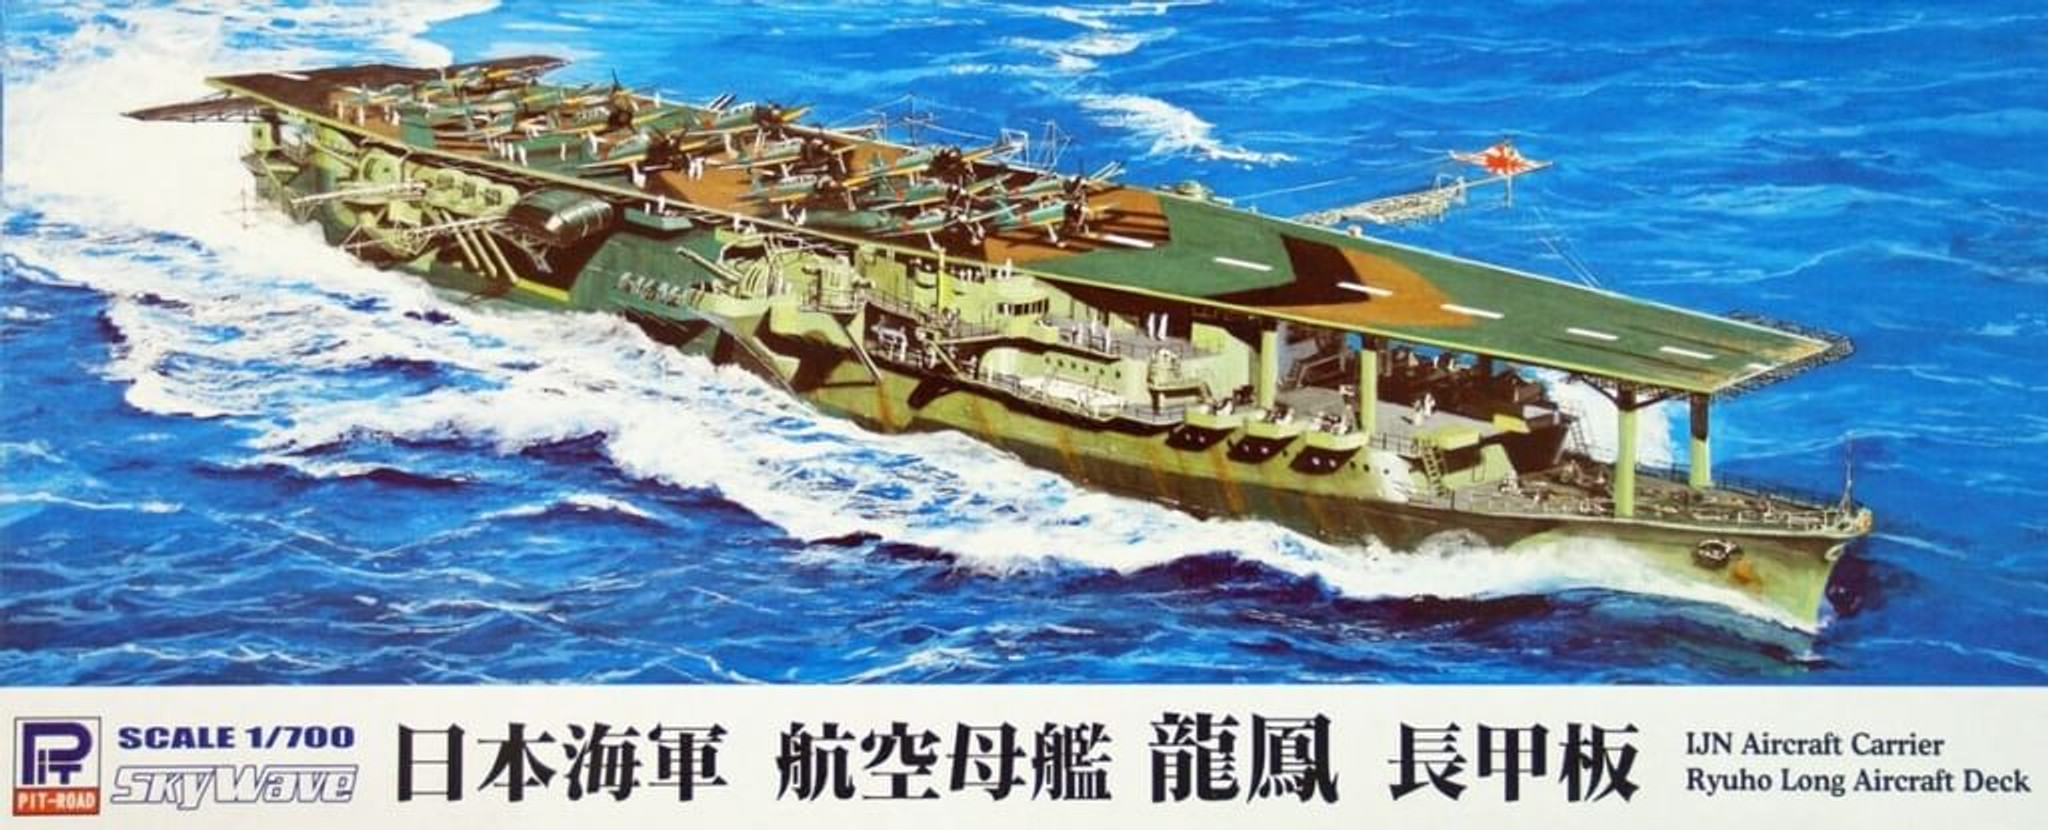 Pit-Road Skywave W-147 IJN Japanese Aircraft Carrier Ryuho ...